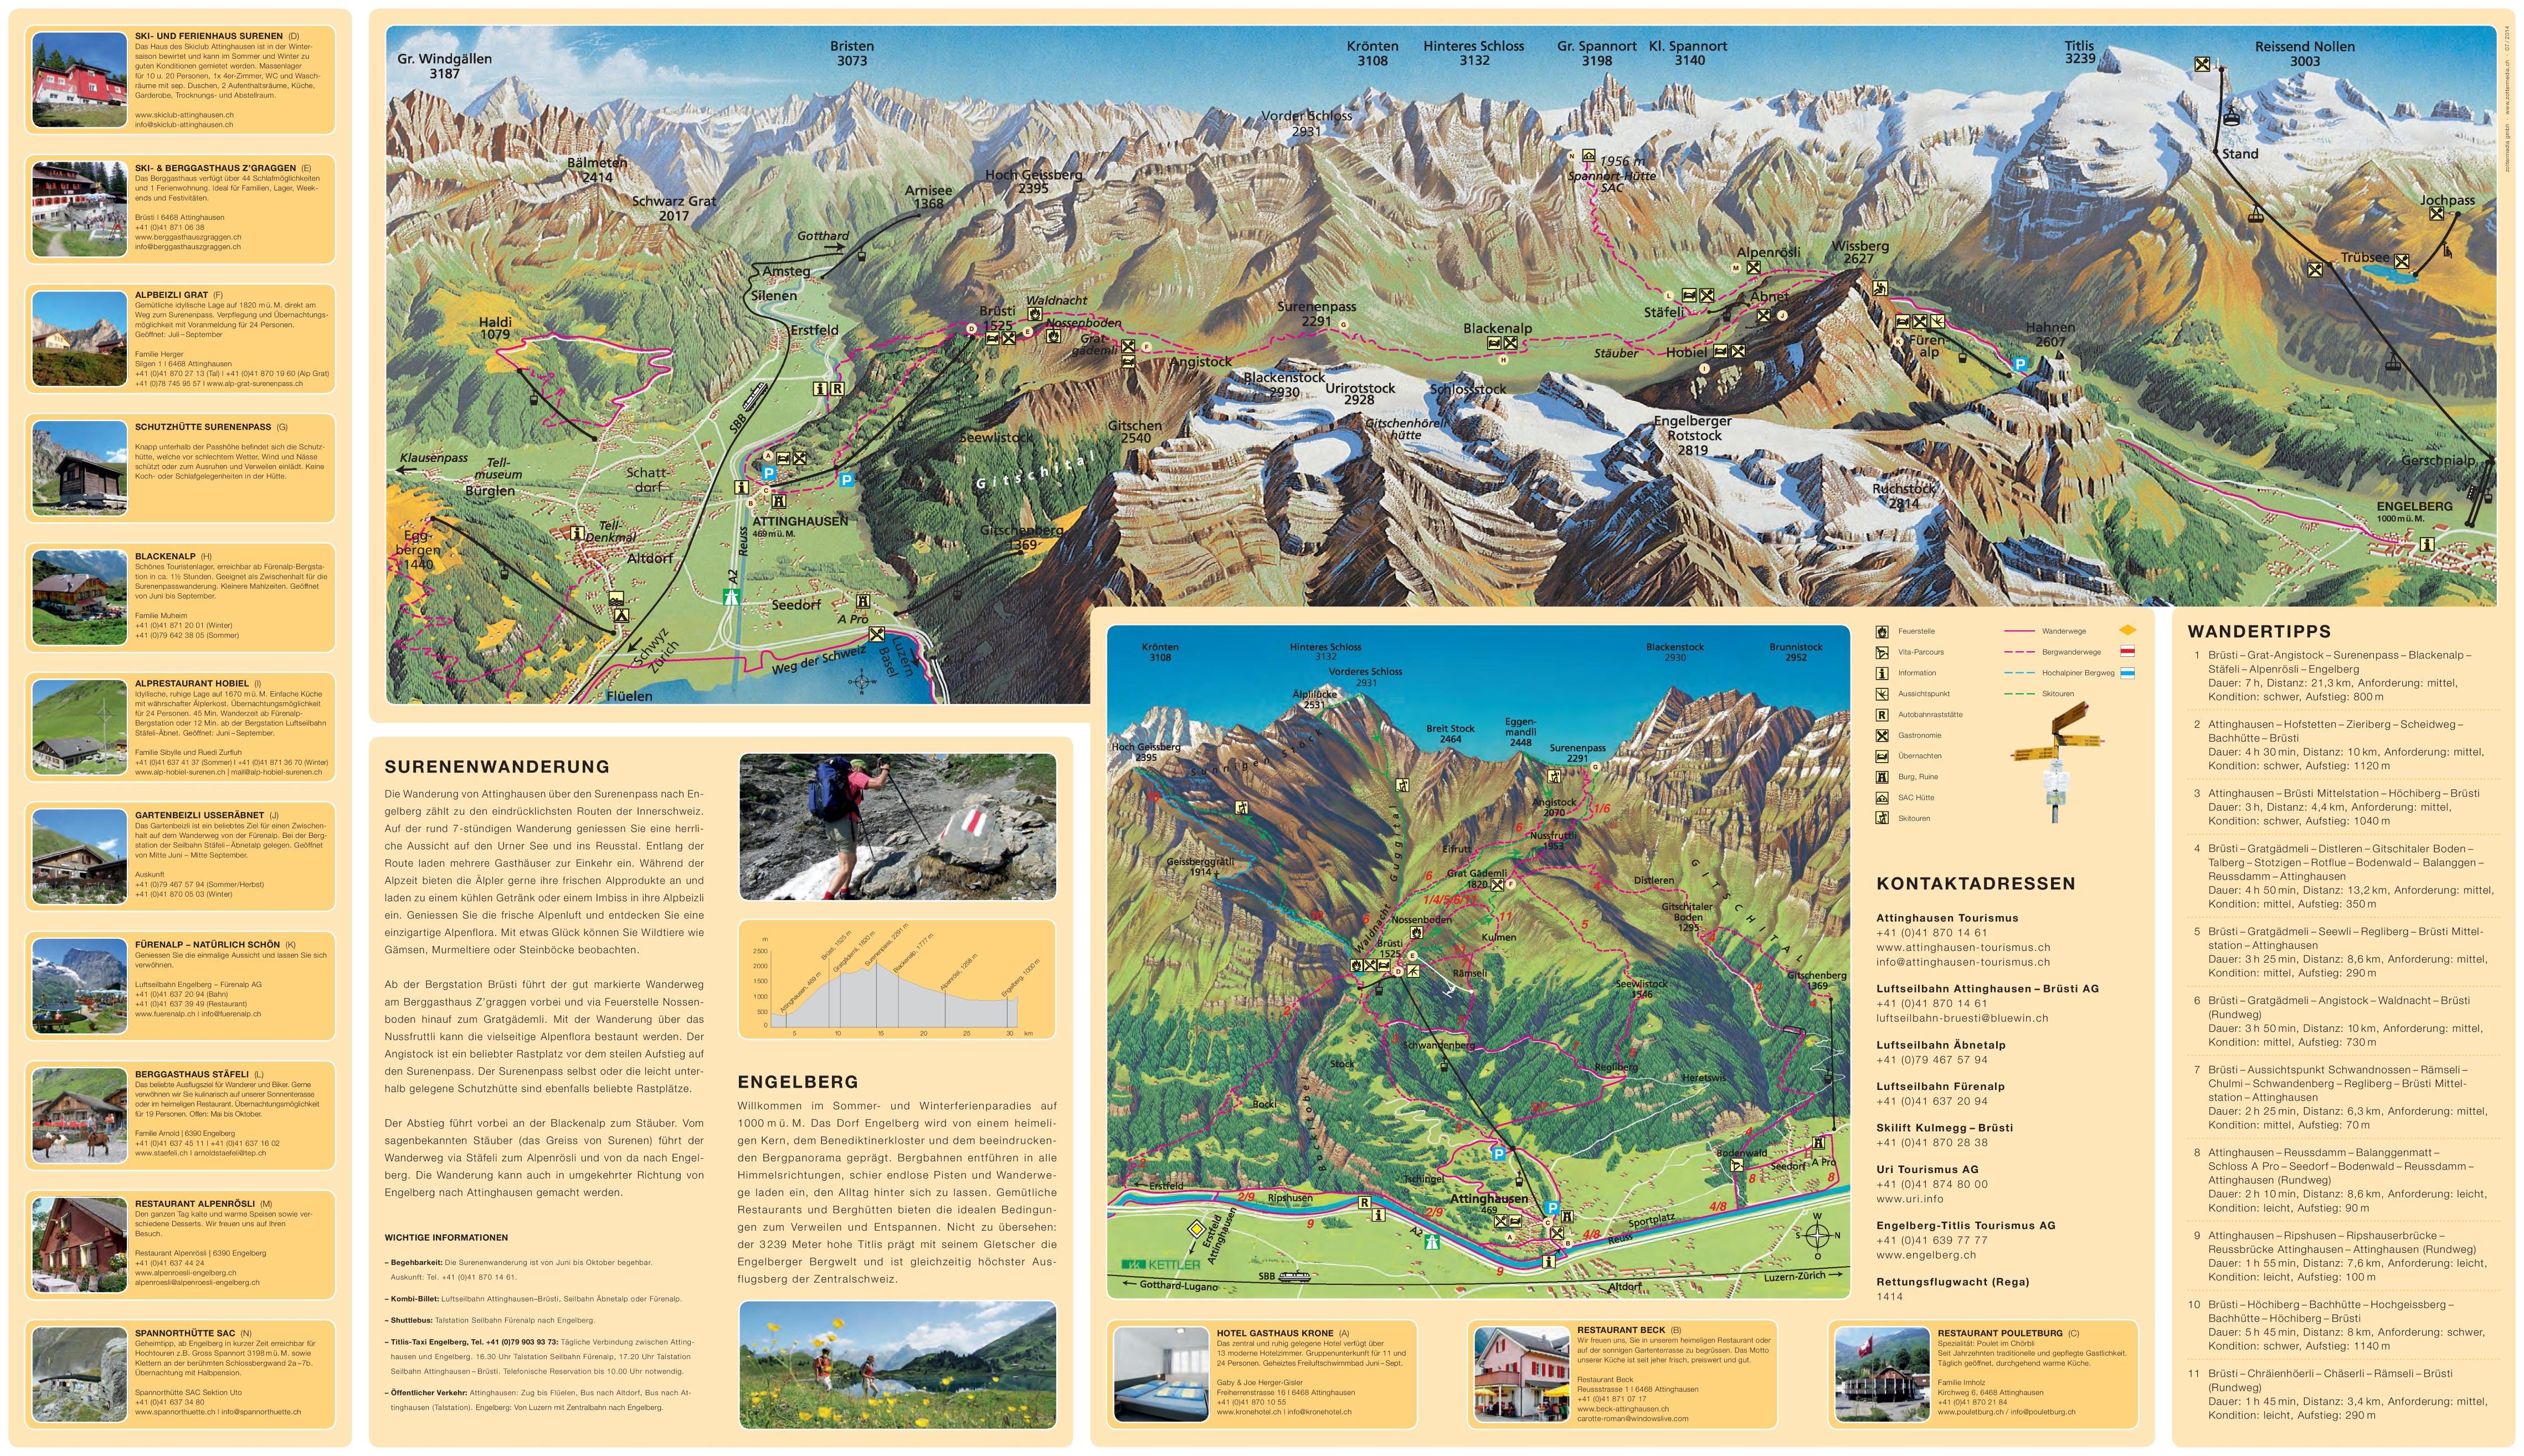 Engelberg trail map